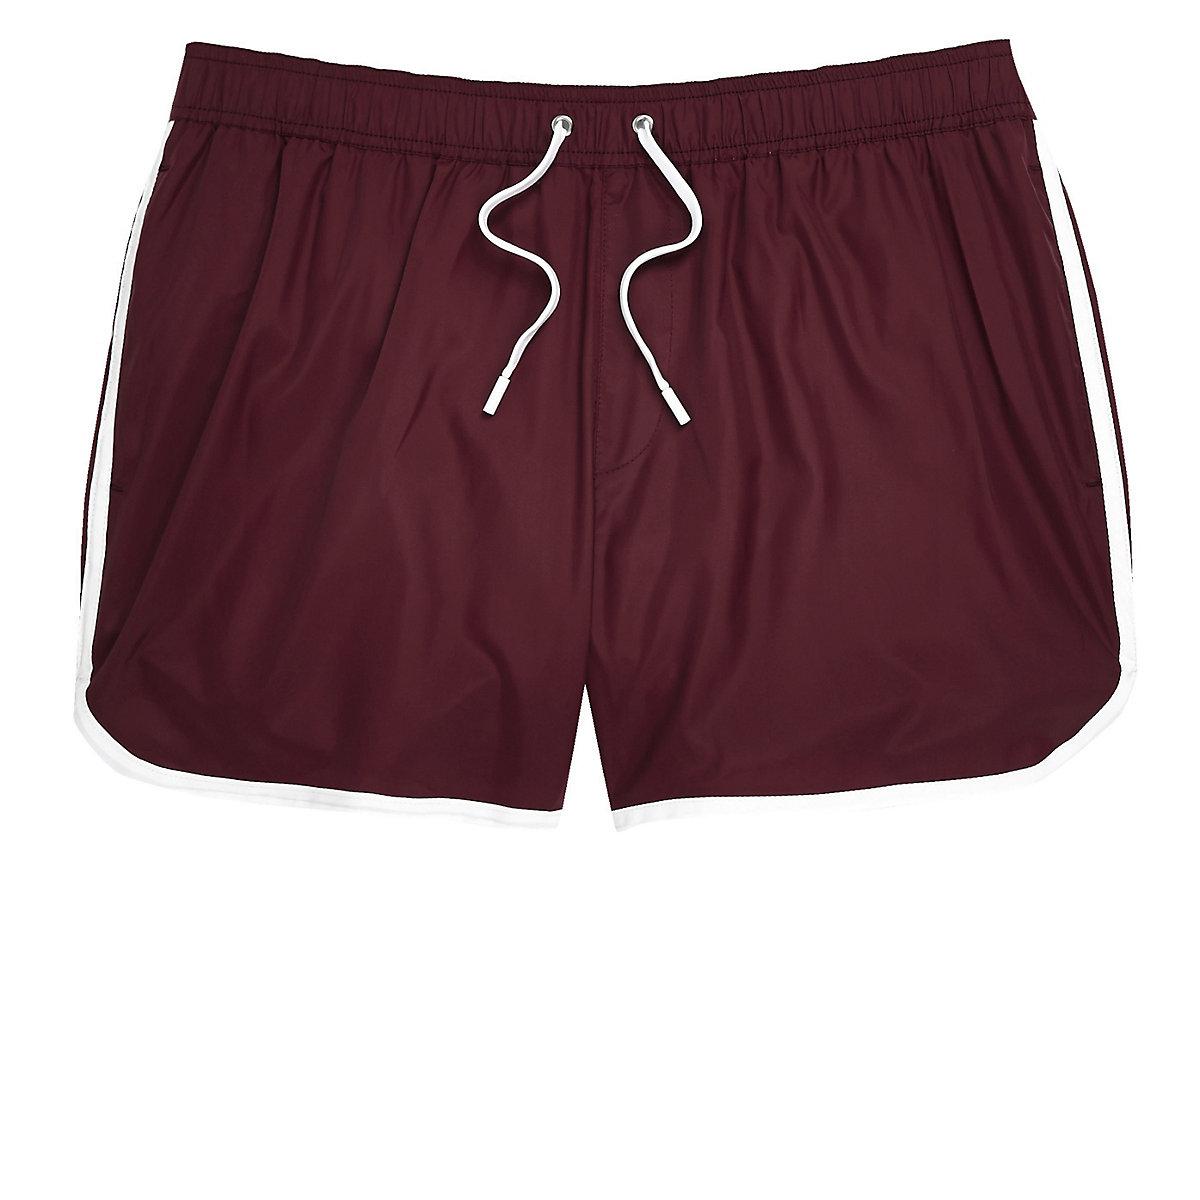 Big and Tall burgundy short swim trunks